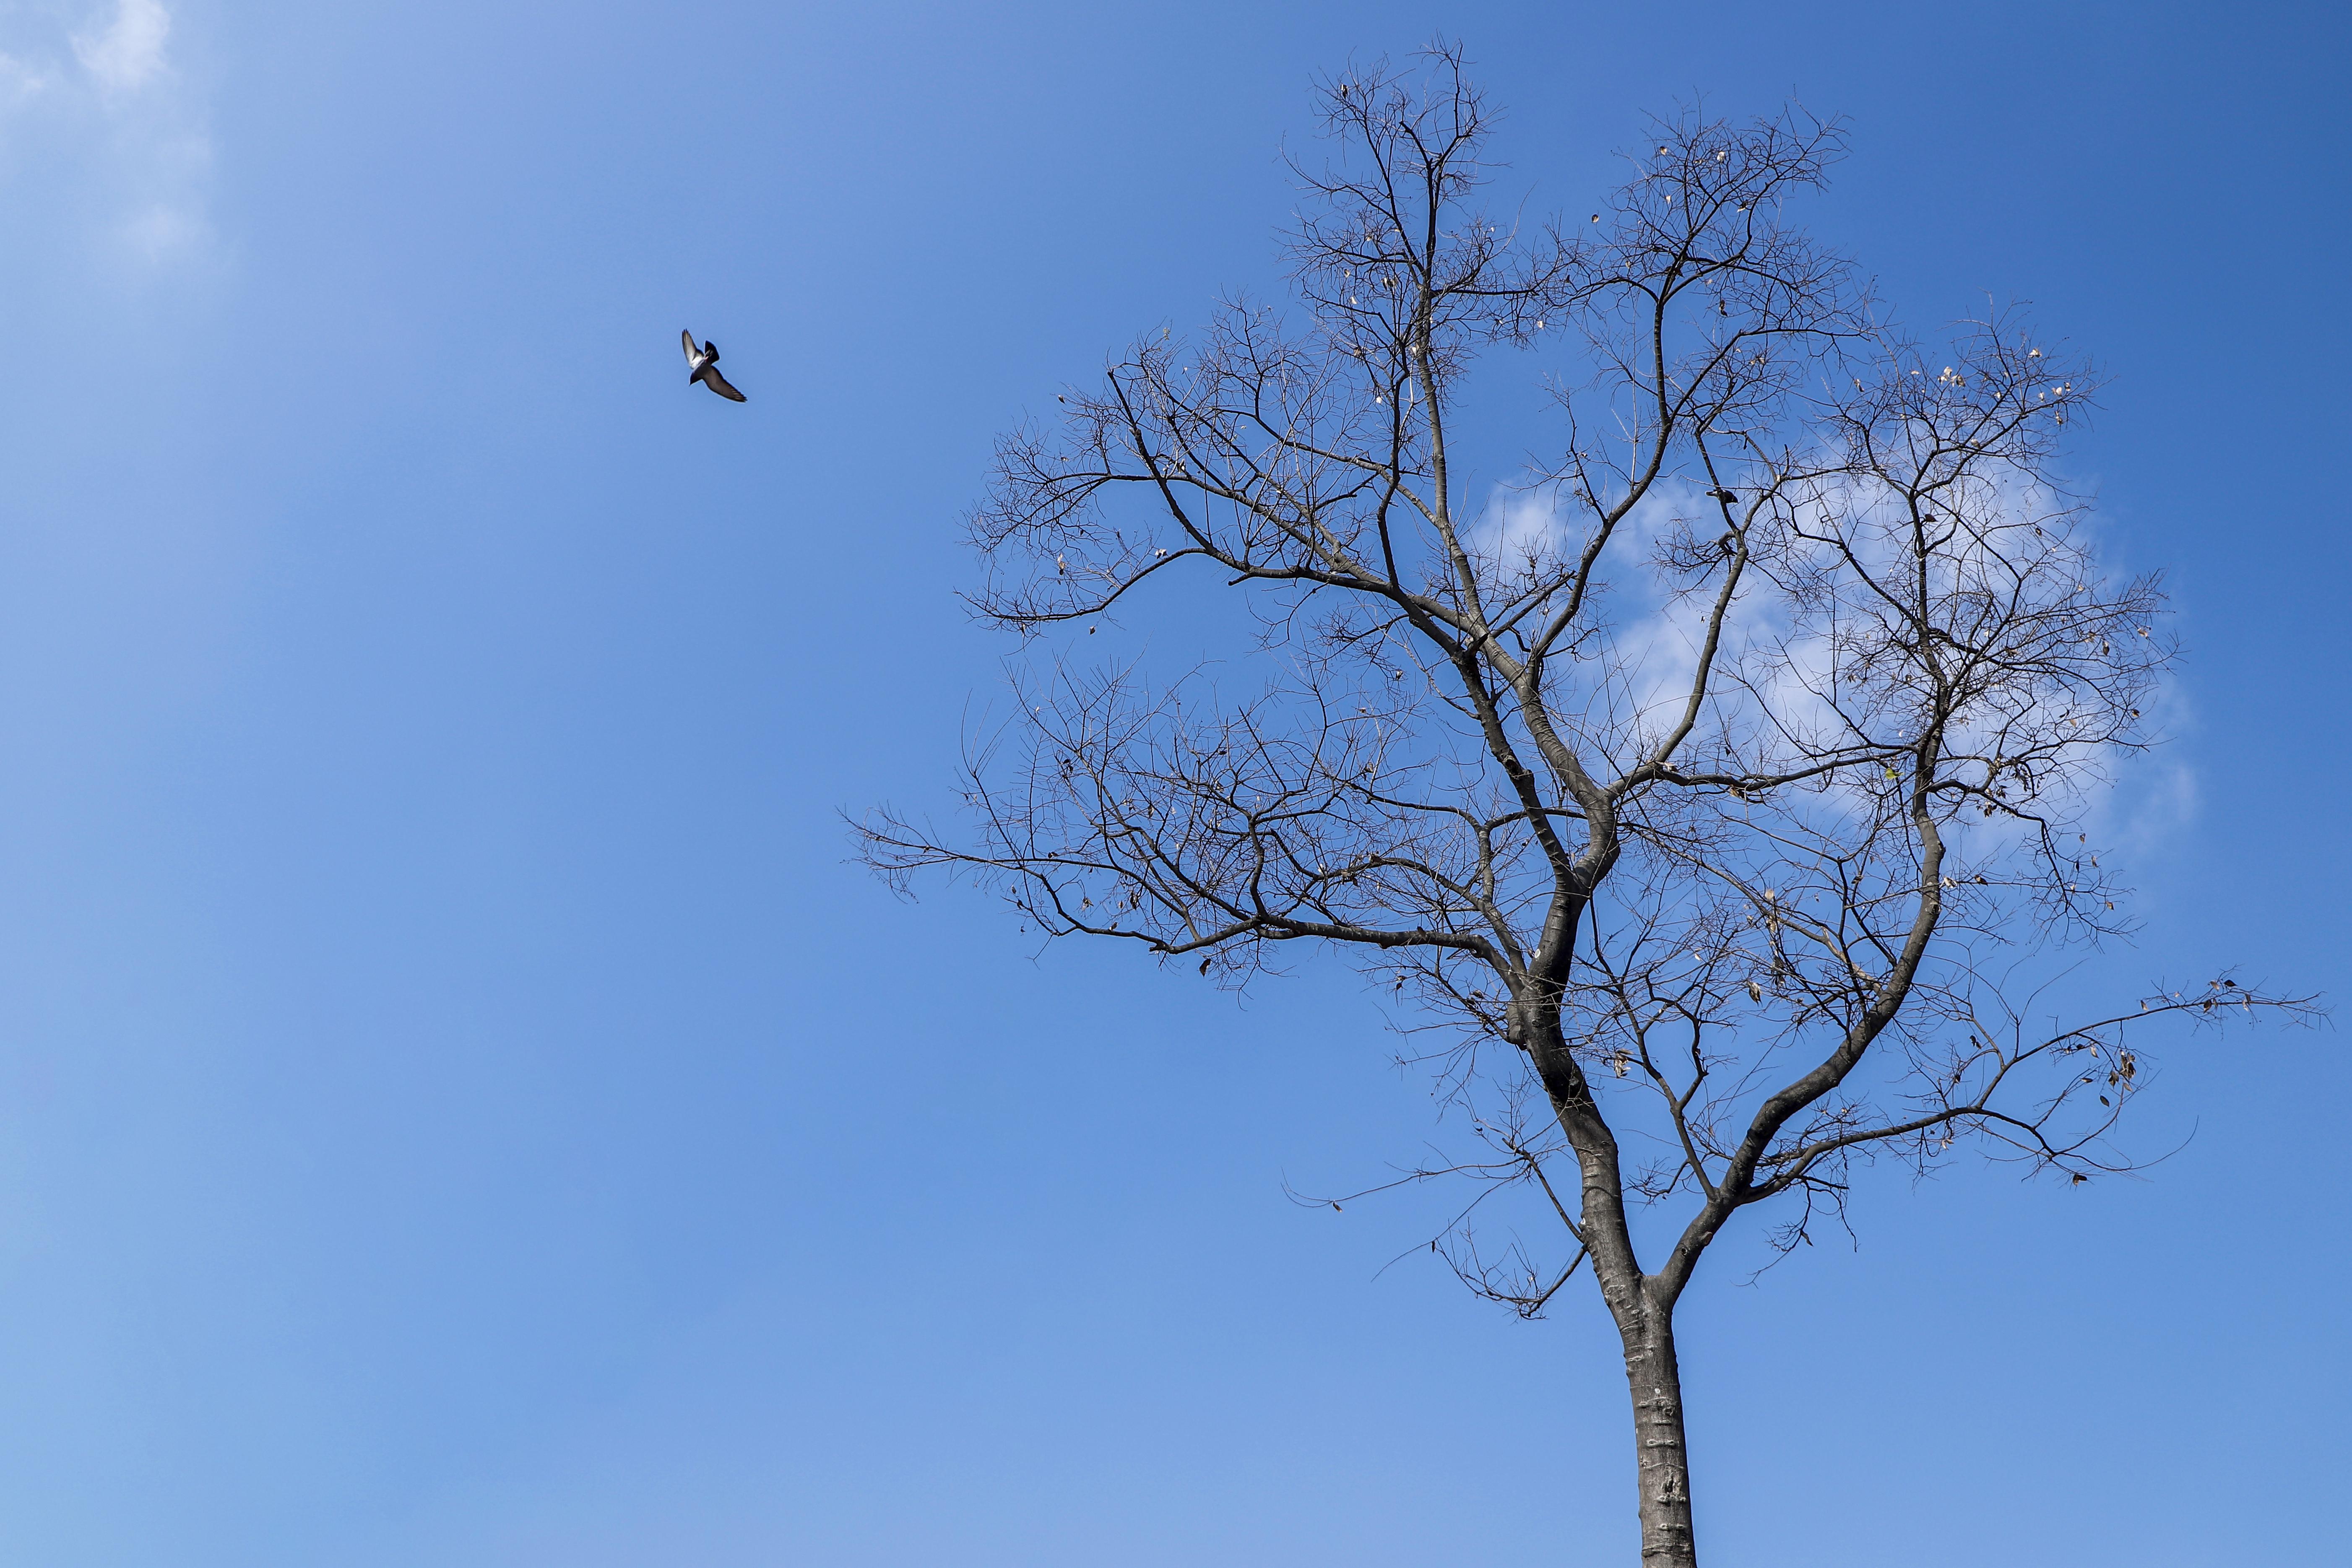 Bare tree and bird